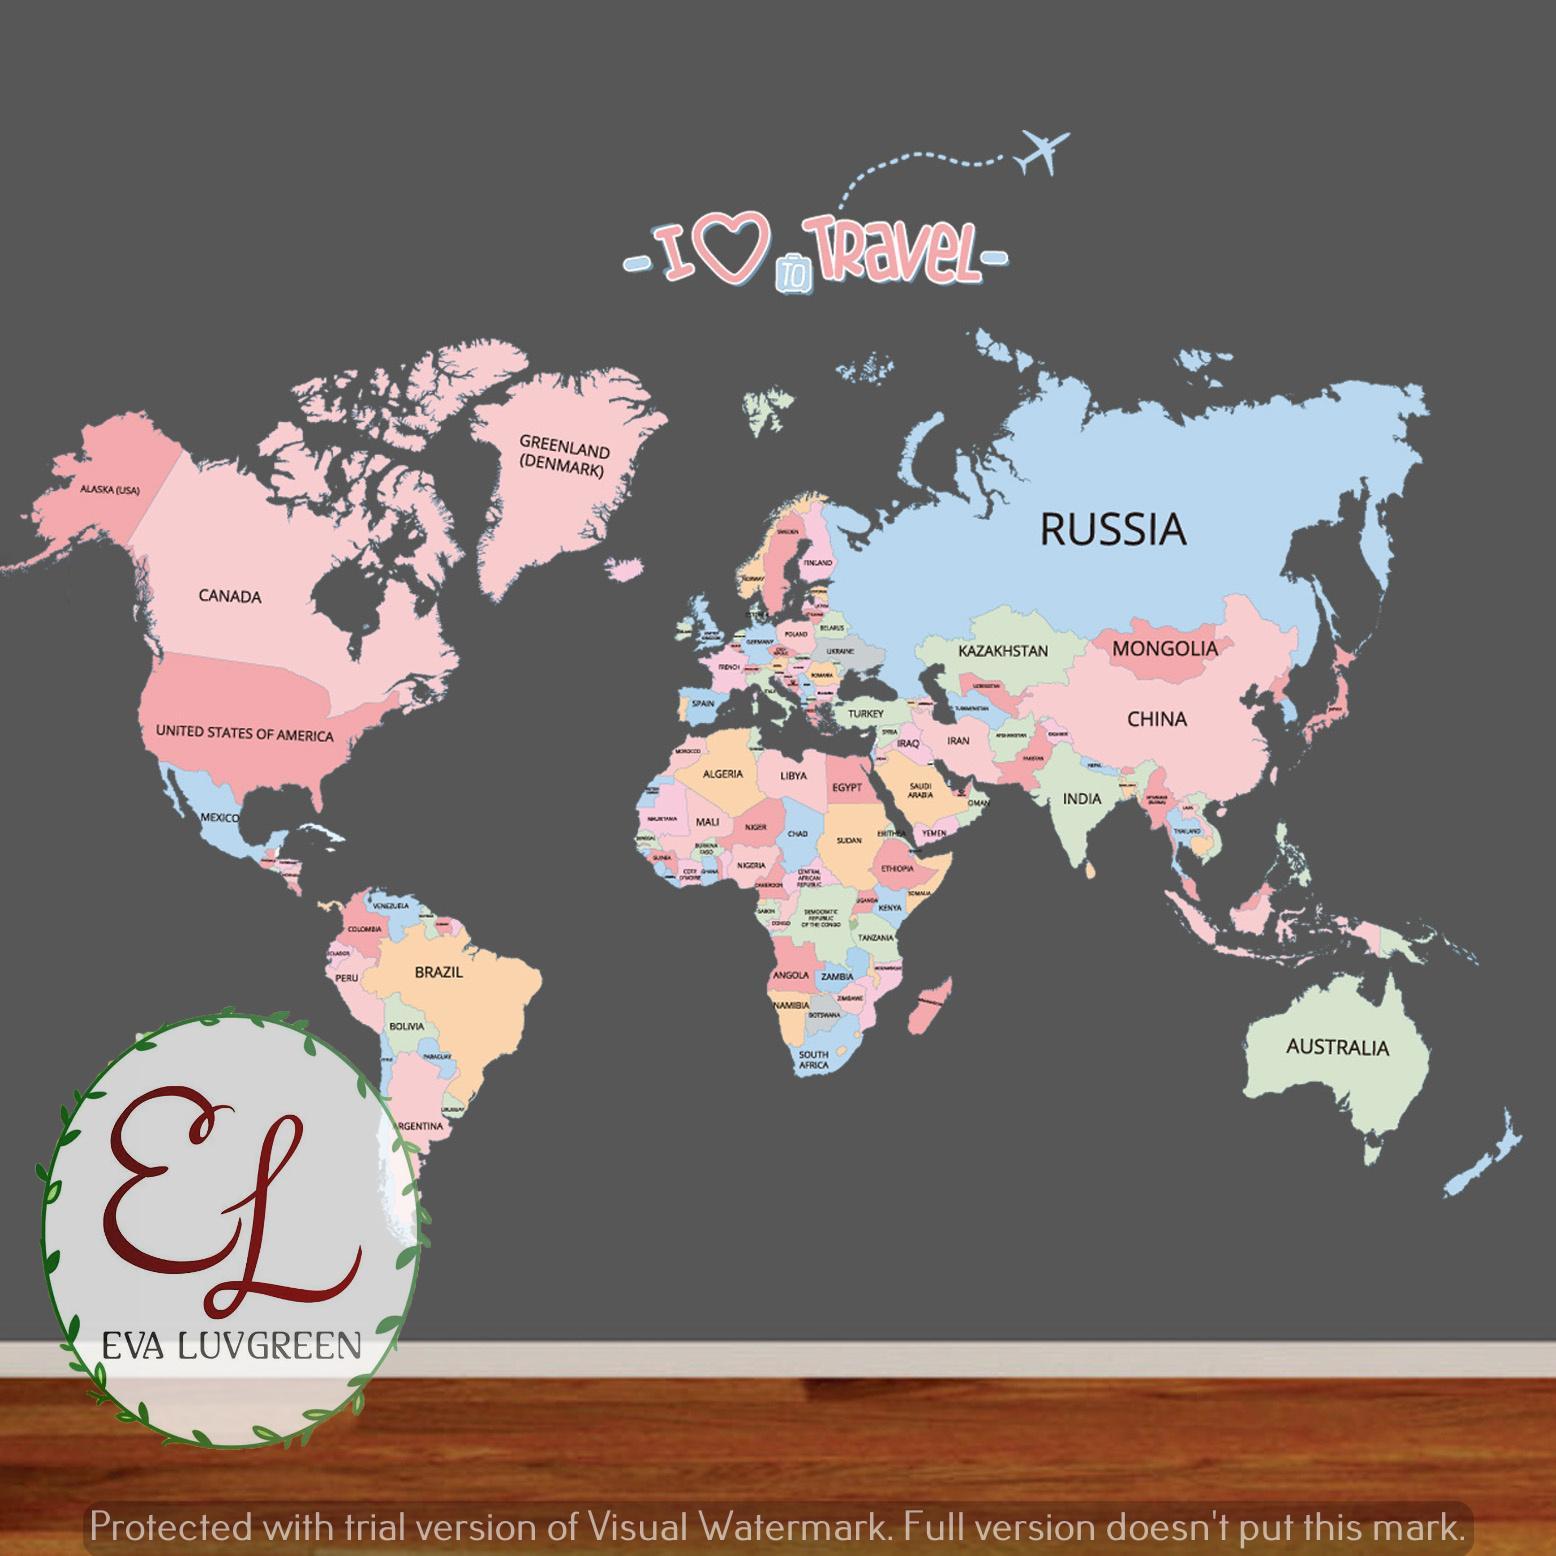 ... Dapat Dilepas Stiker Dinding Hitam. Source · Eva Luvgreen Wall Sticker World Map/ Peta Dunia I Love Travel Ukuran 60x90cm/ Stiker